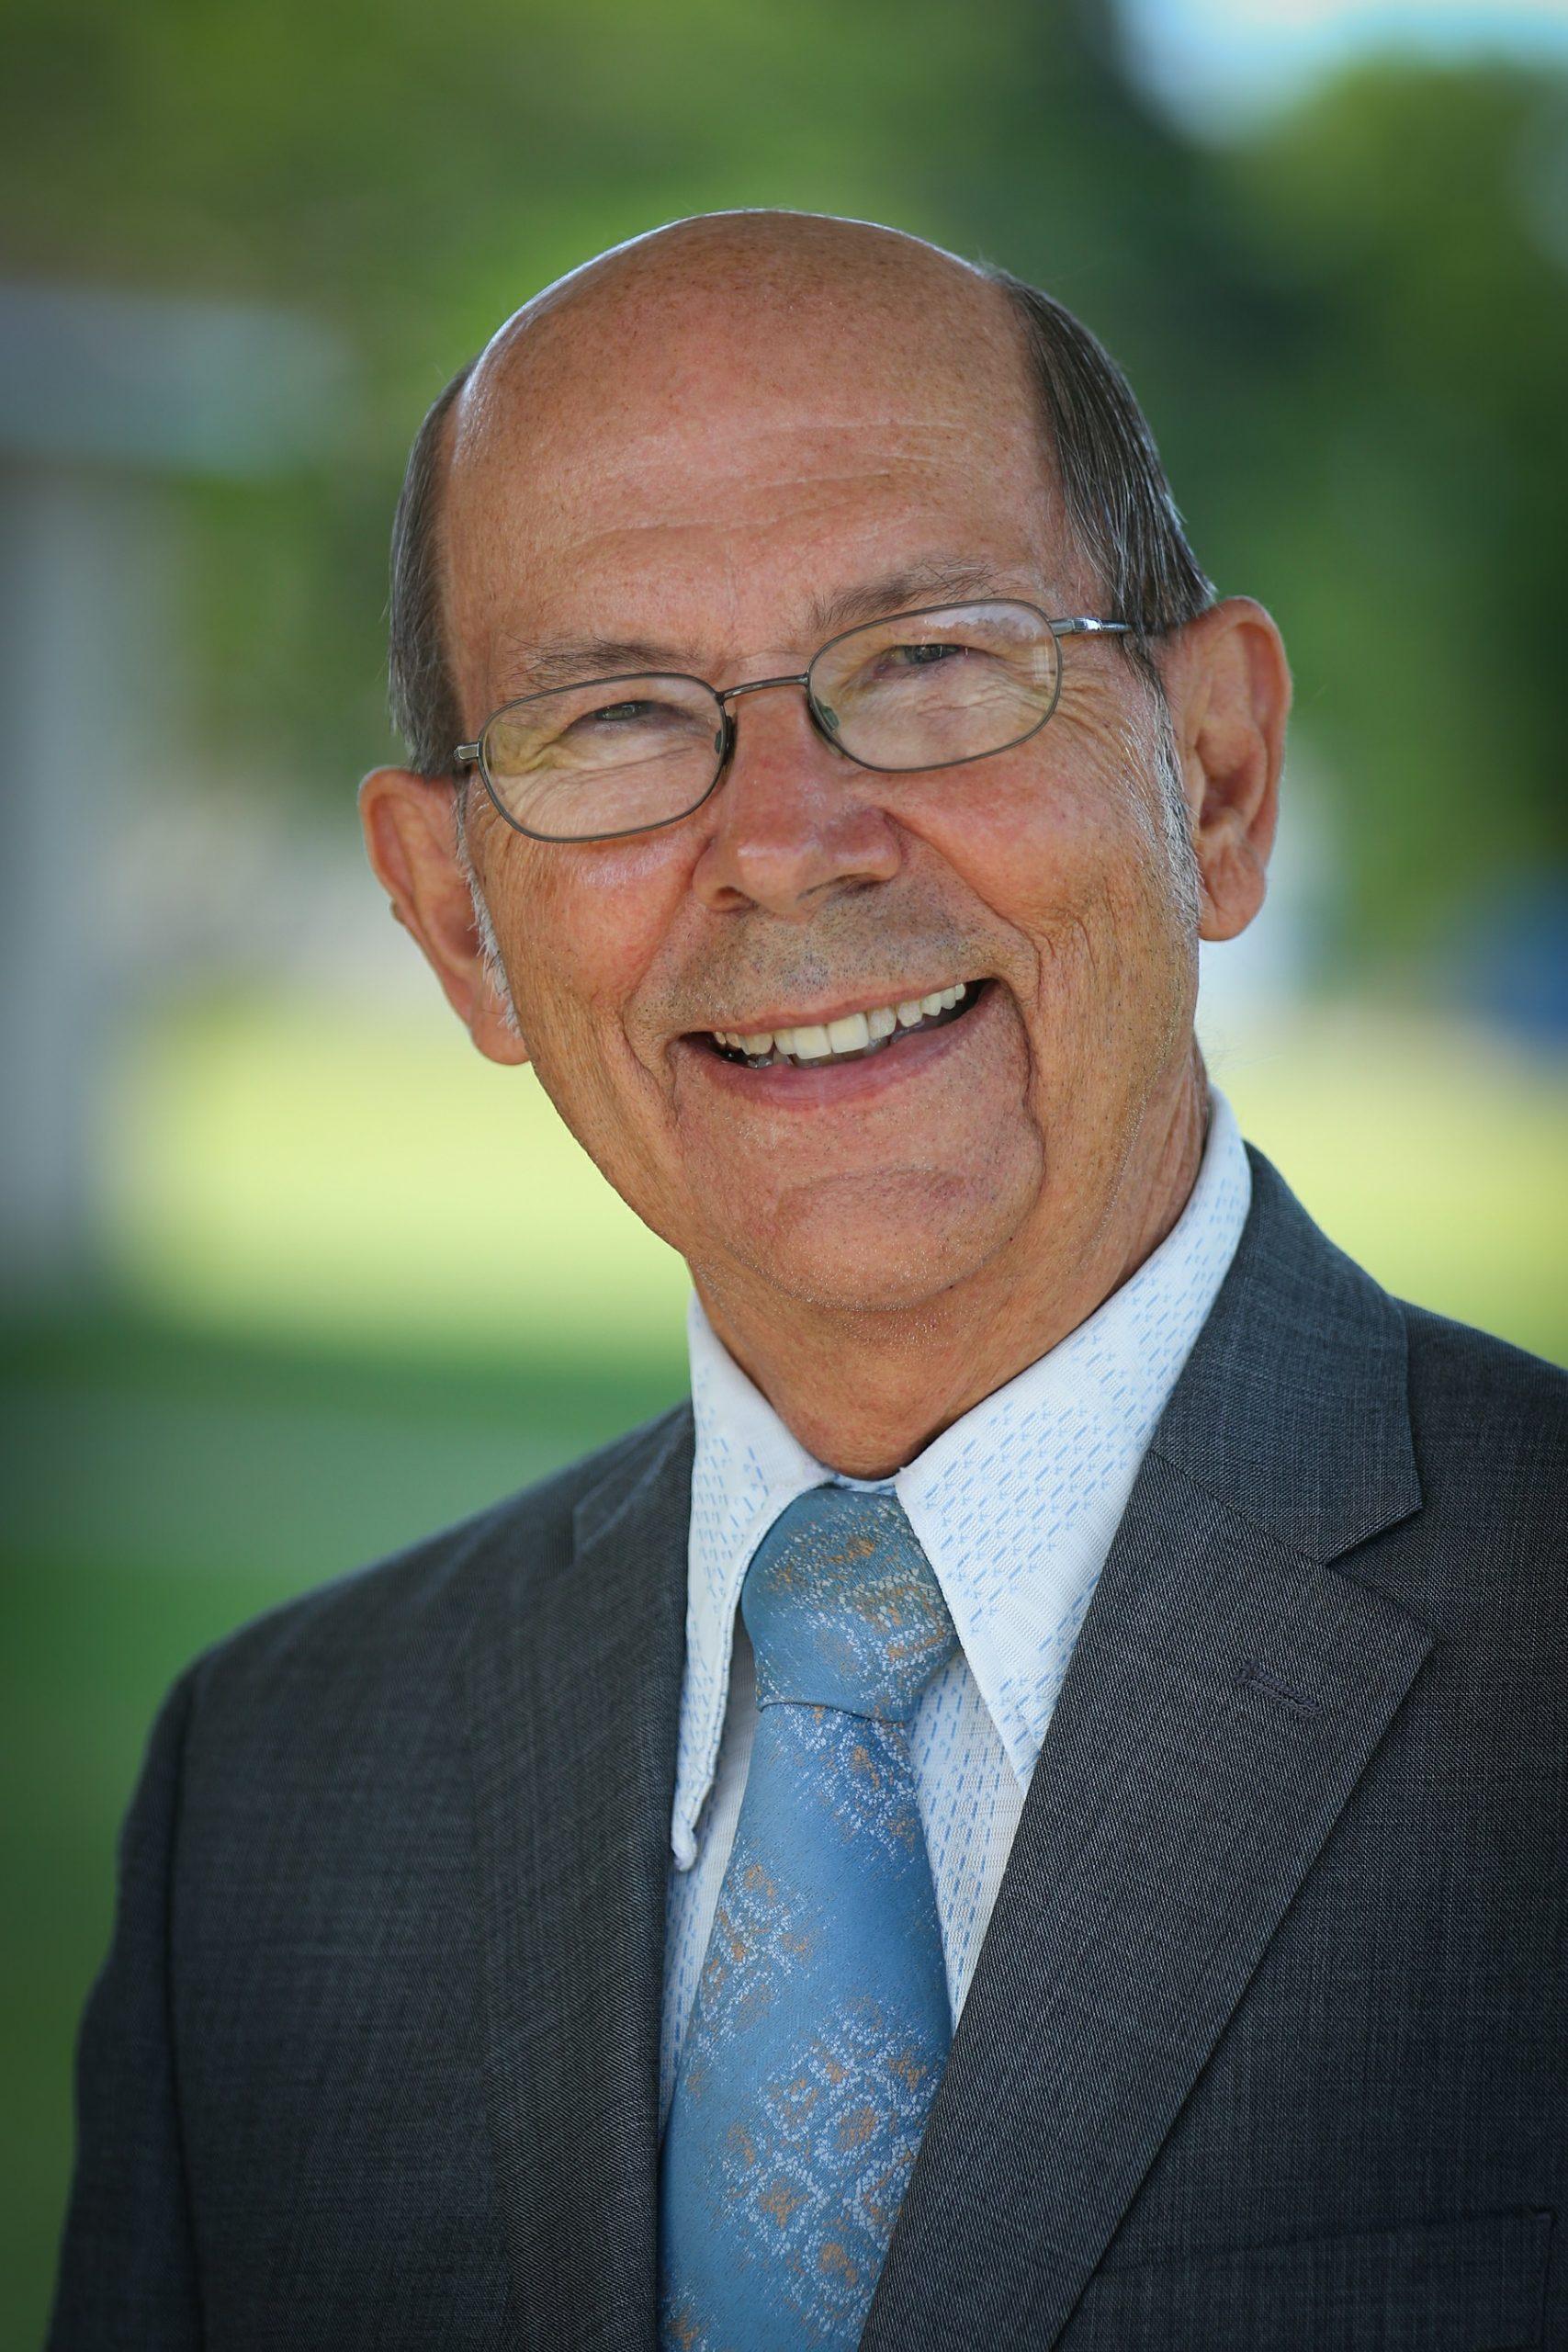 Dennis Priebe